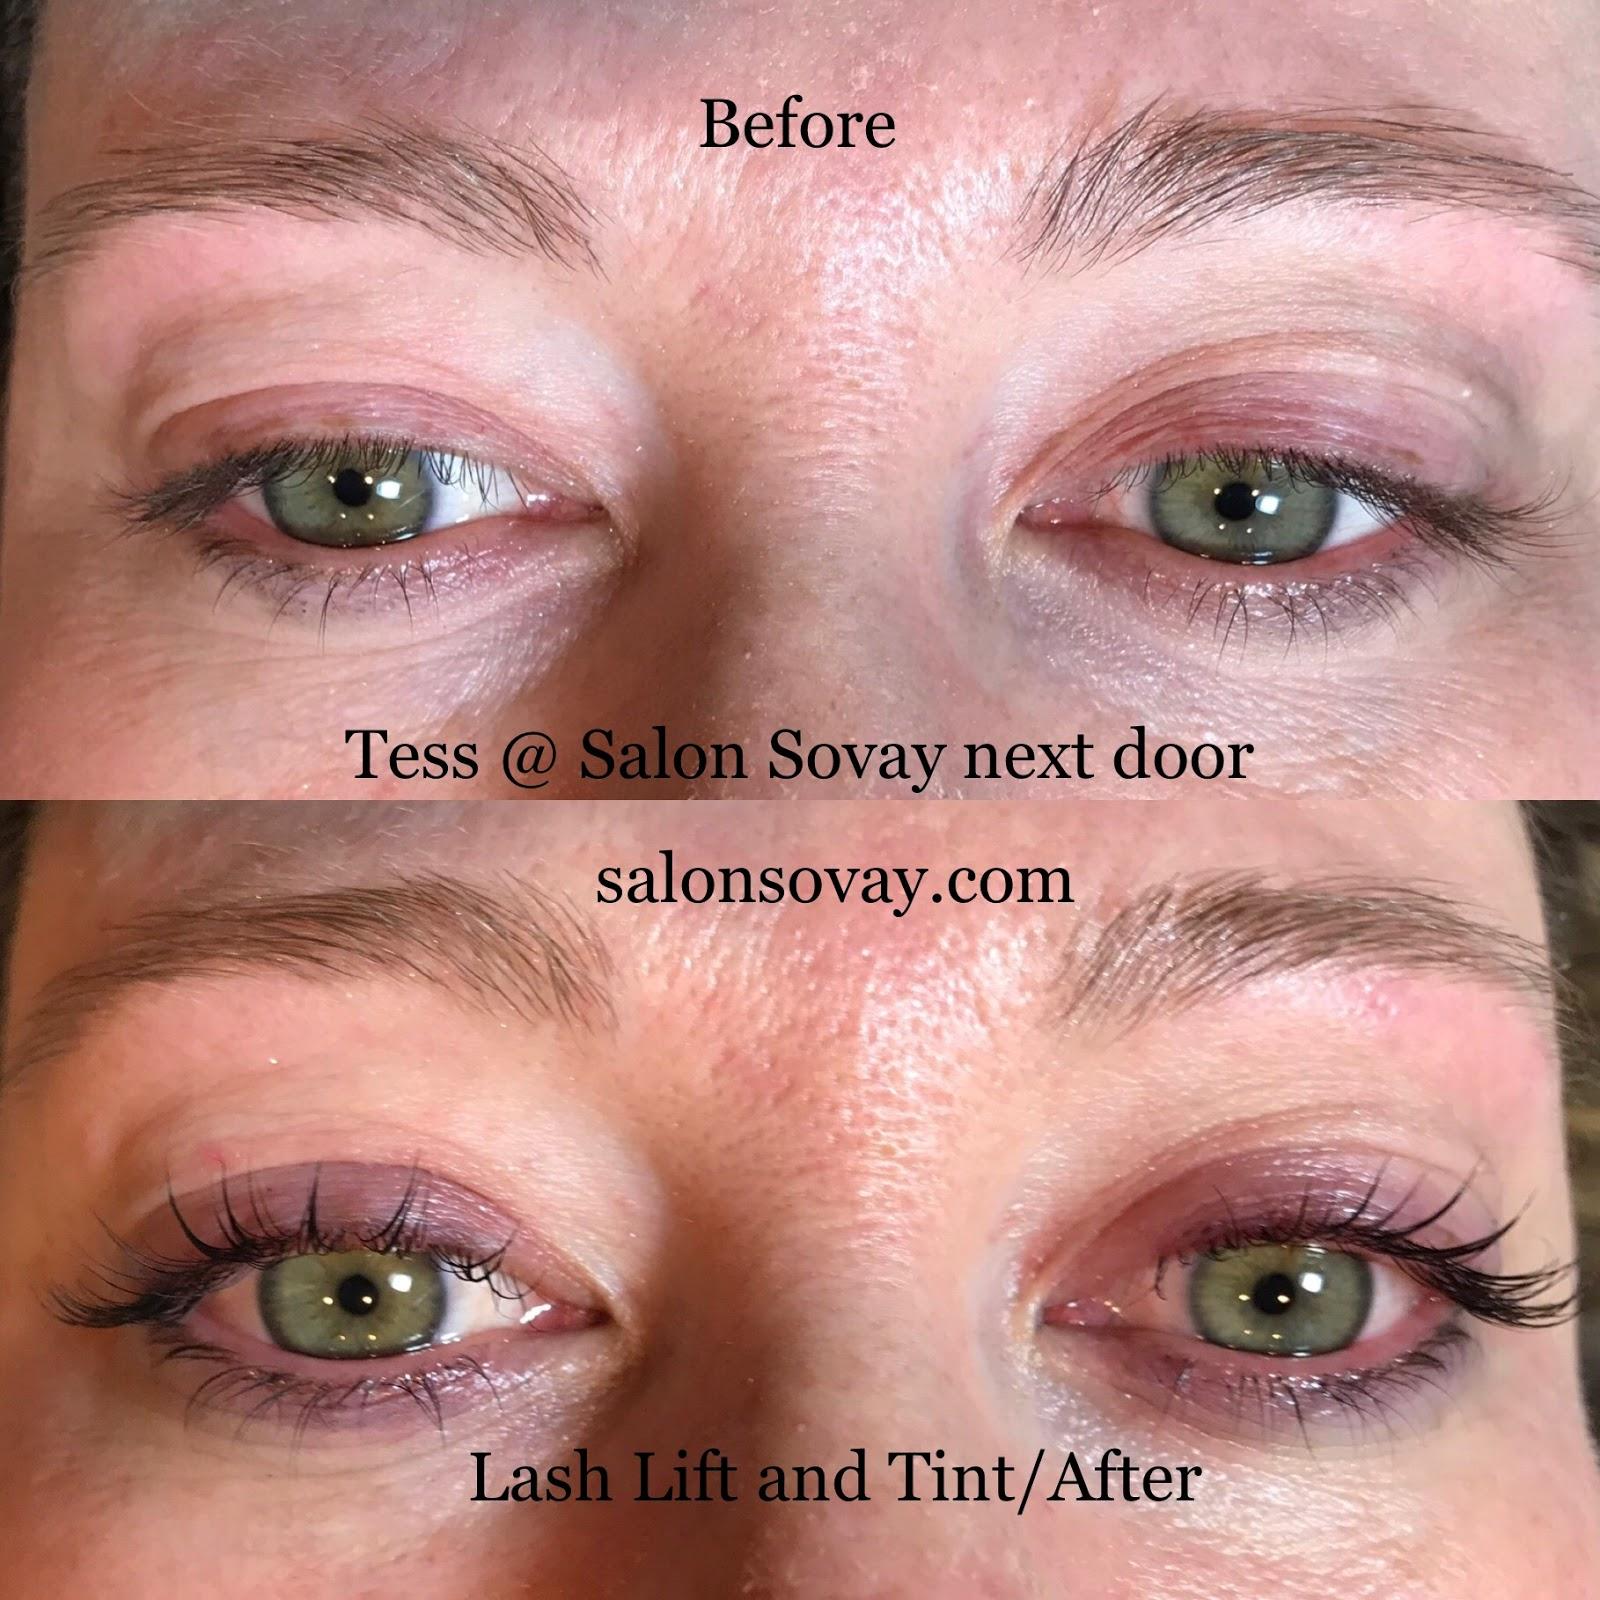 Salon Sovay Lash Permlash Lift And Lash Tint Service At Salon